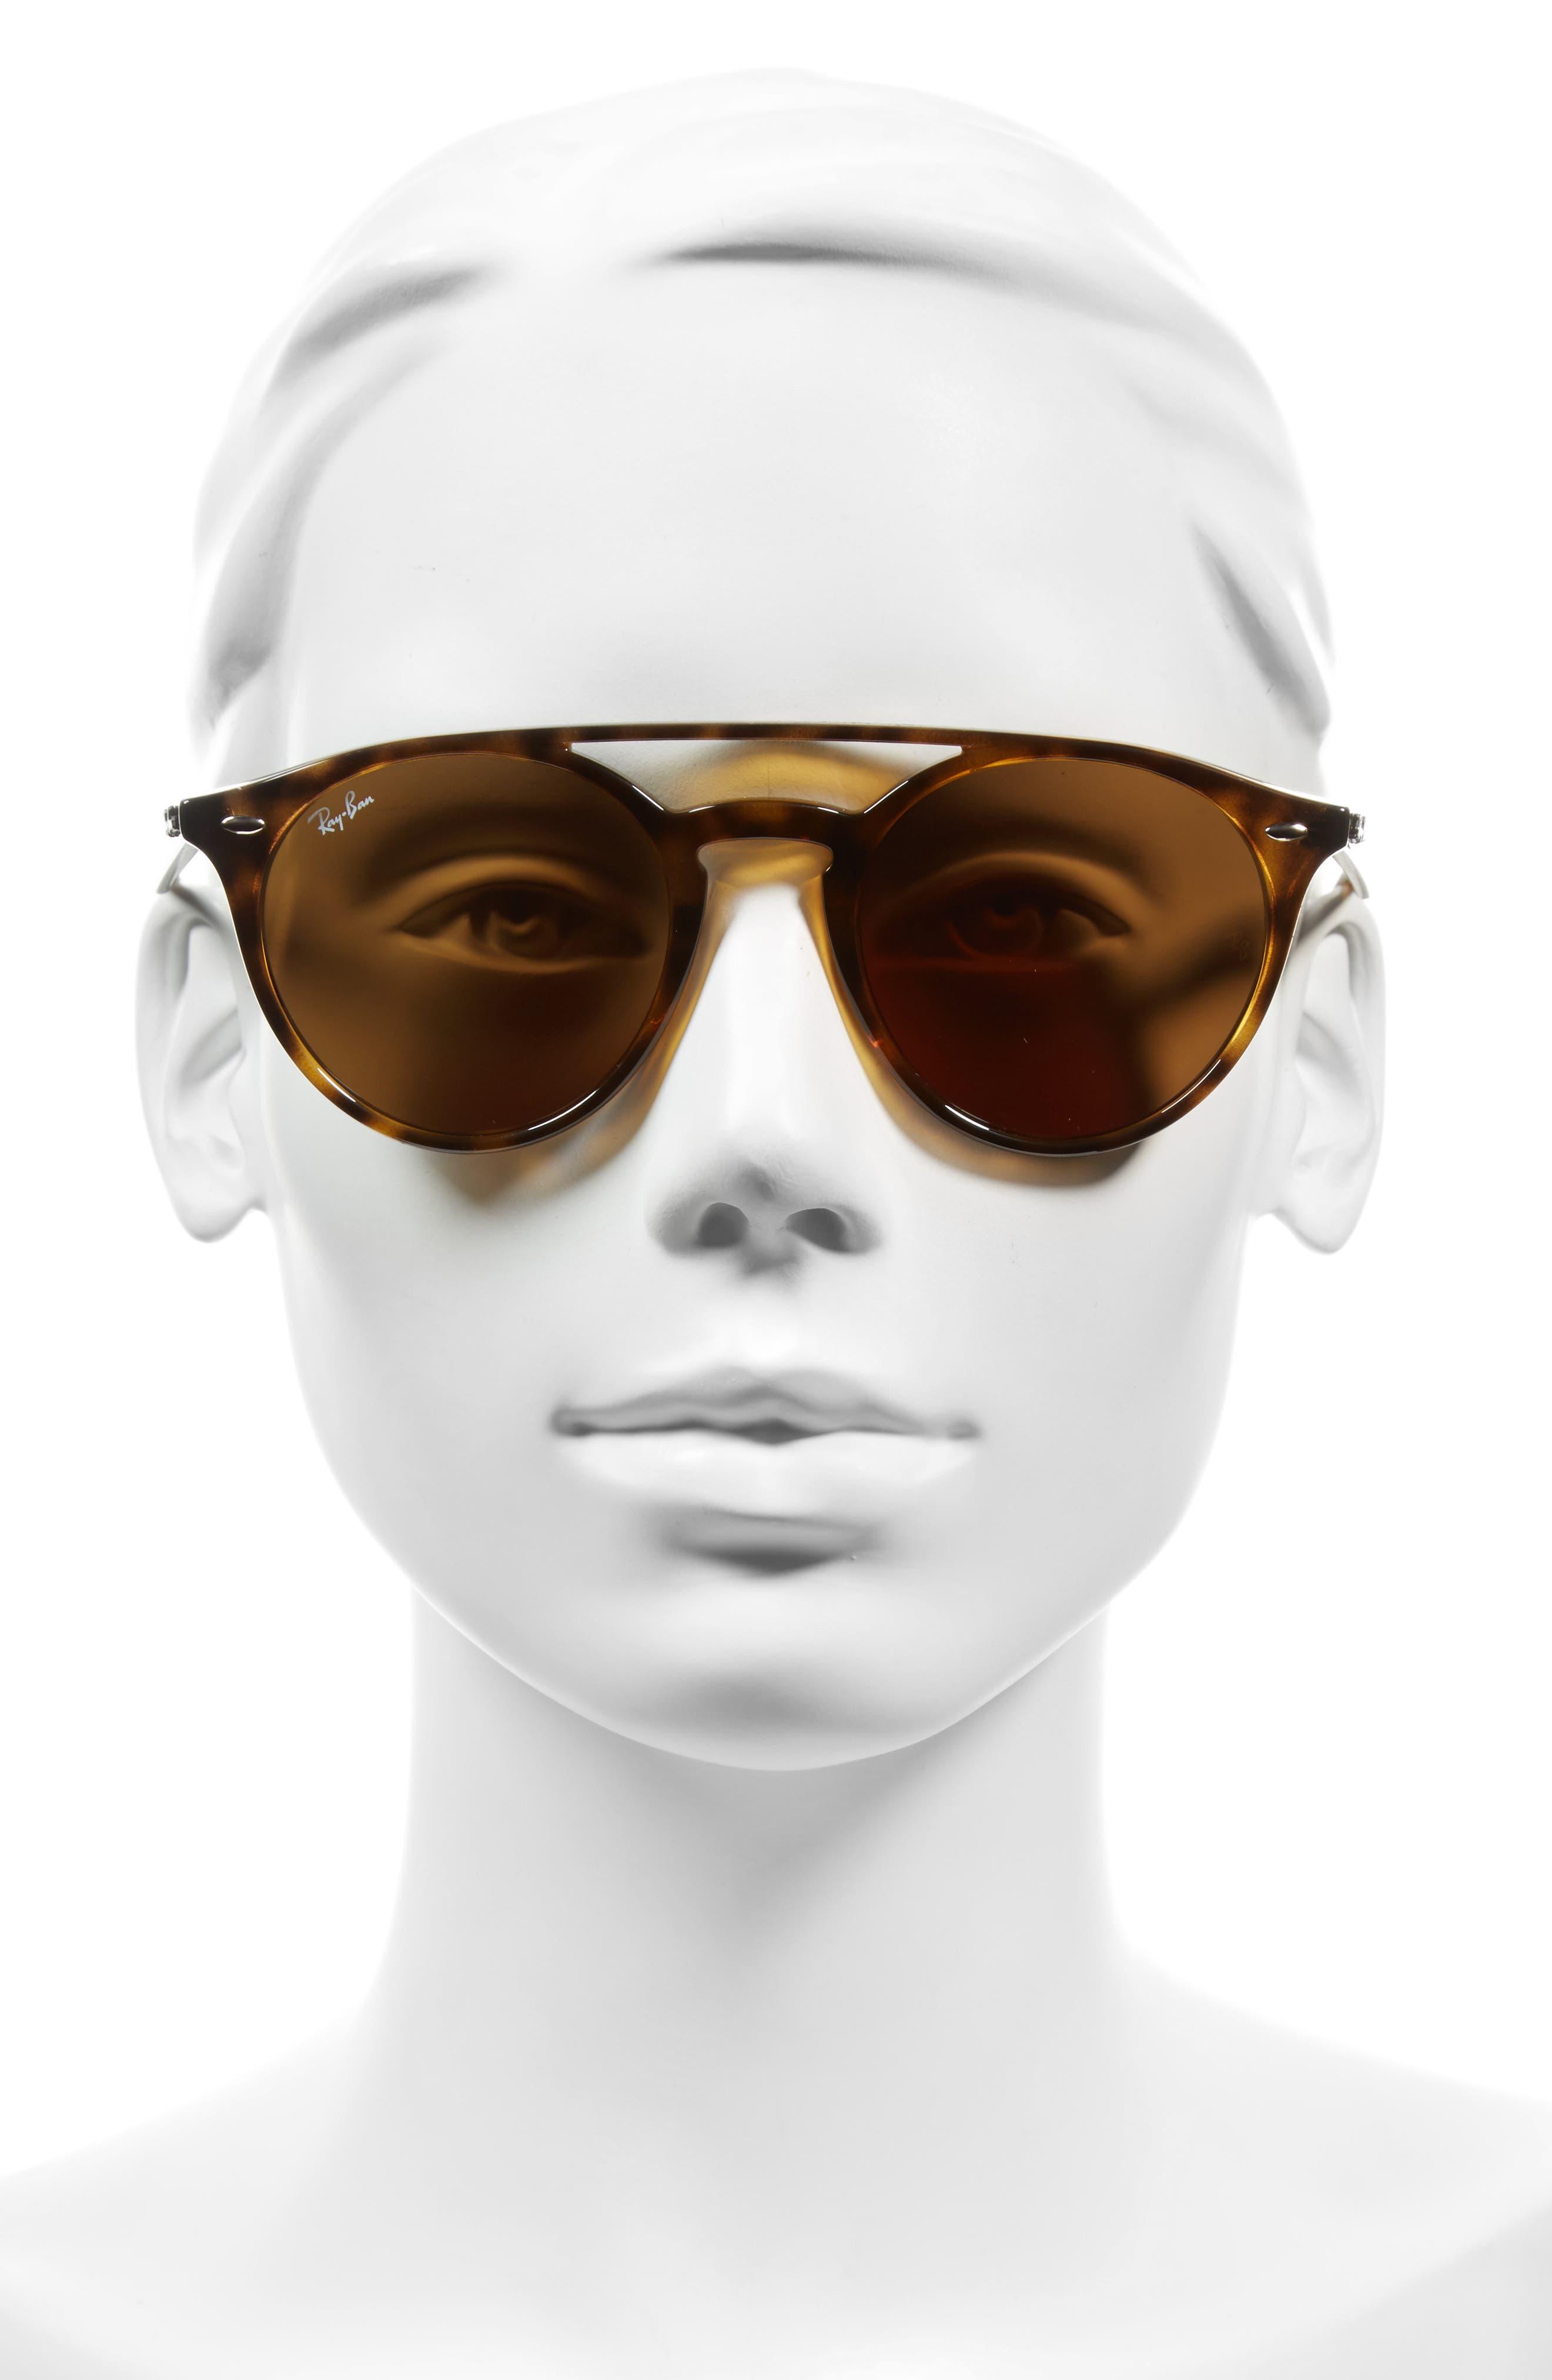 51mm Sunglasses,                             Alternate thumbnail 2, color,                             200